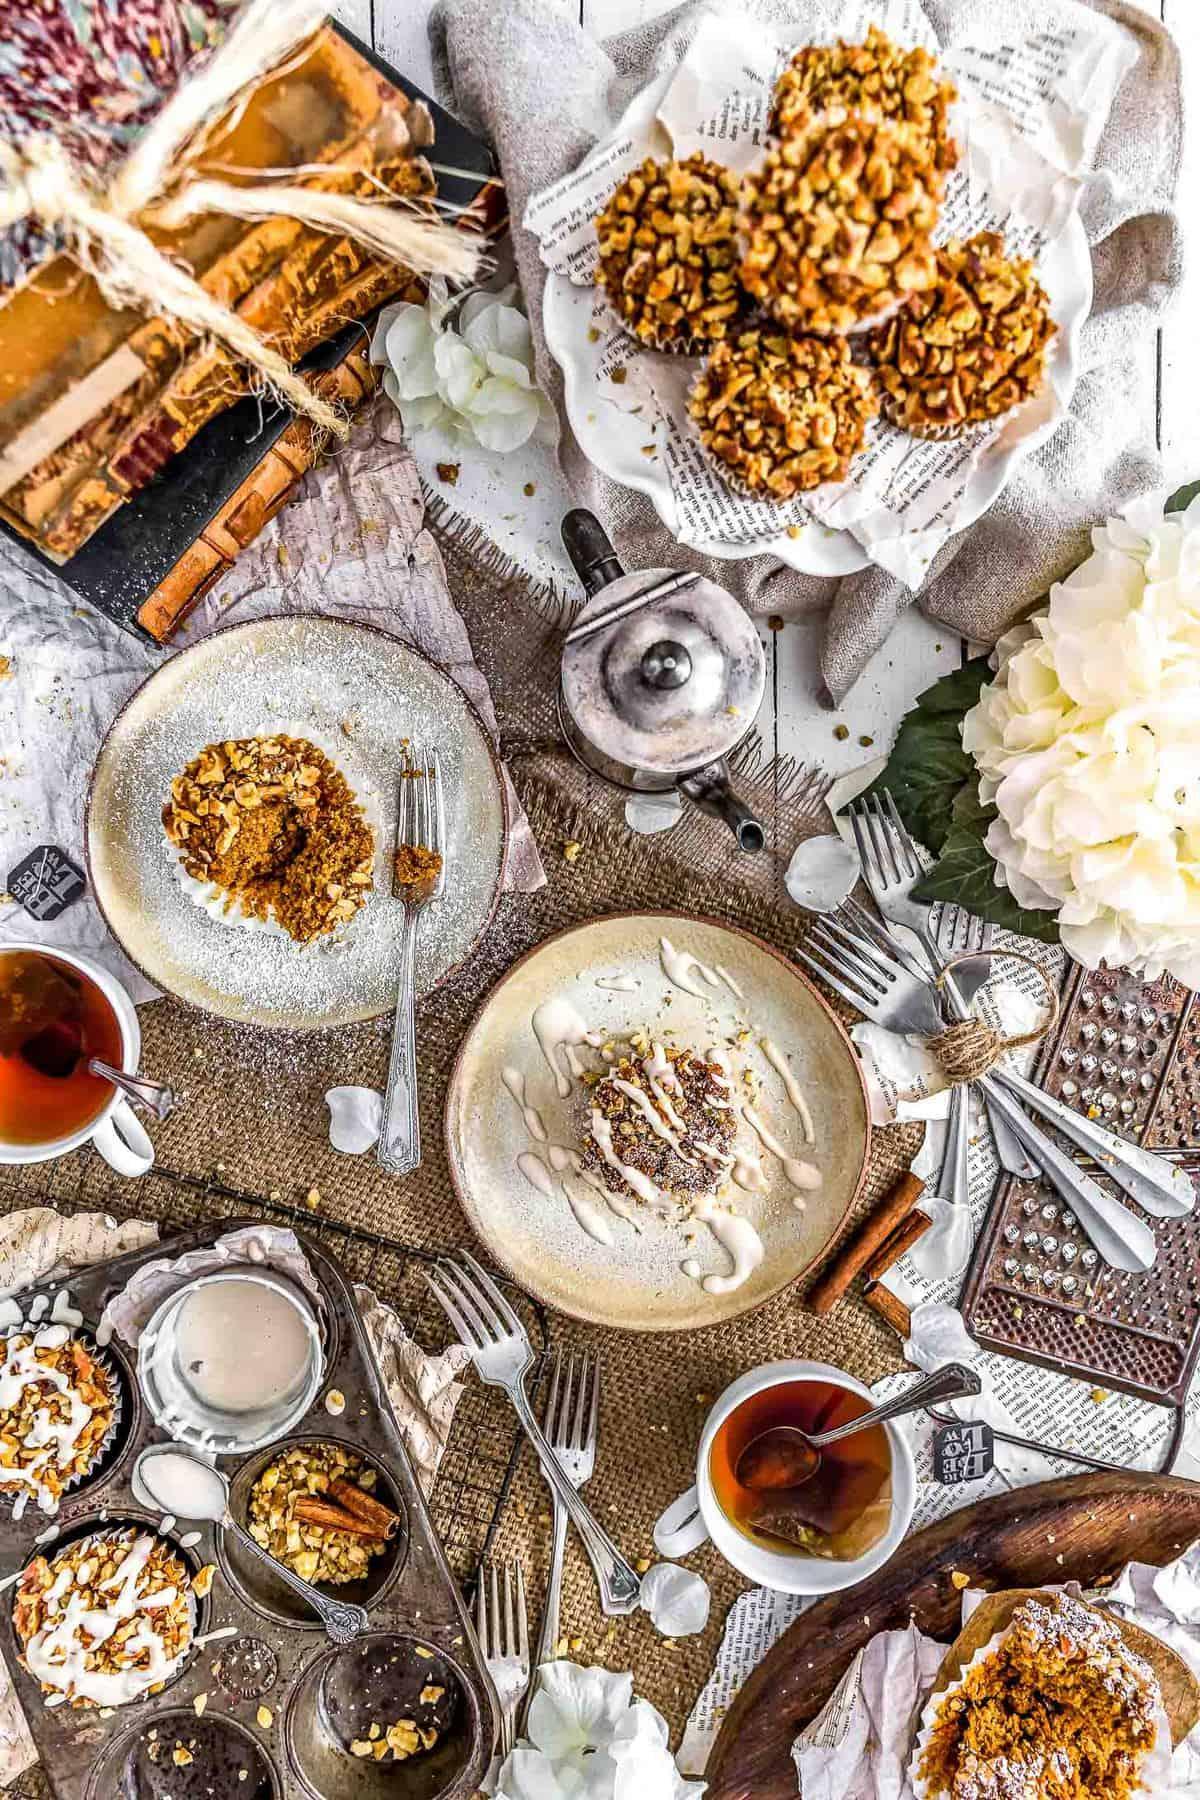 Tablescape of Healthy Vegan Pumpkin Muffins